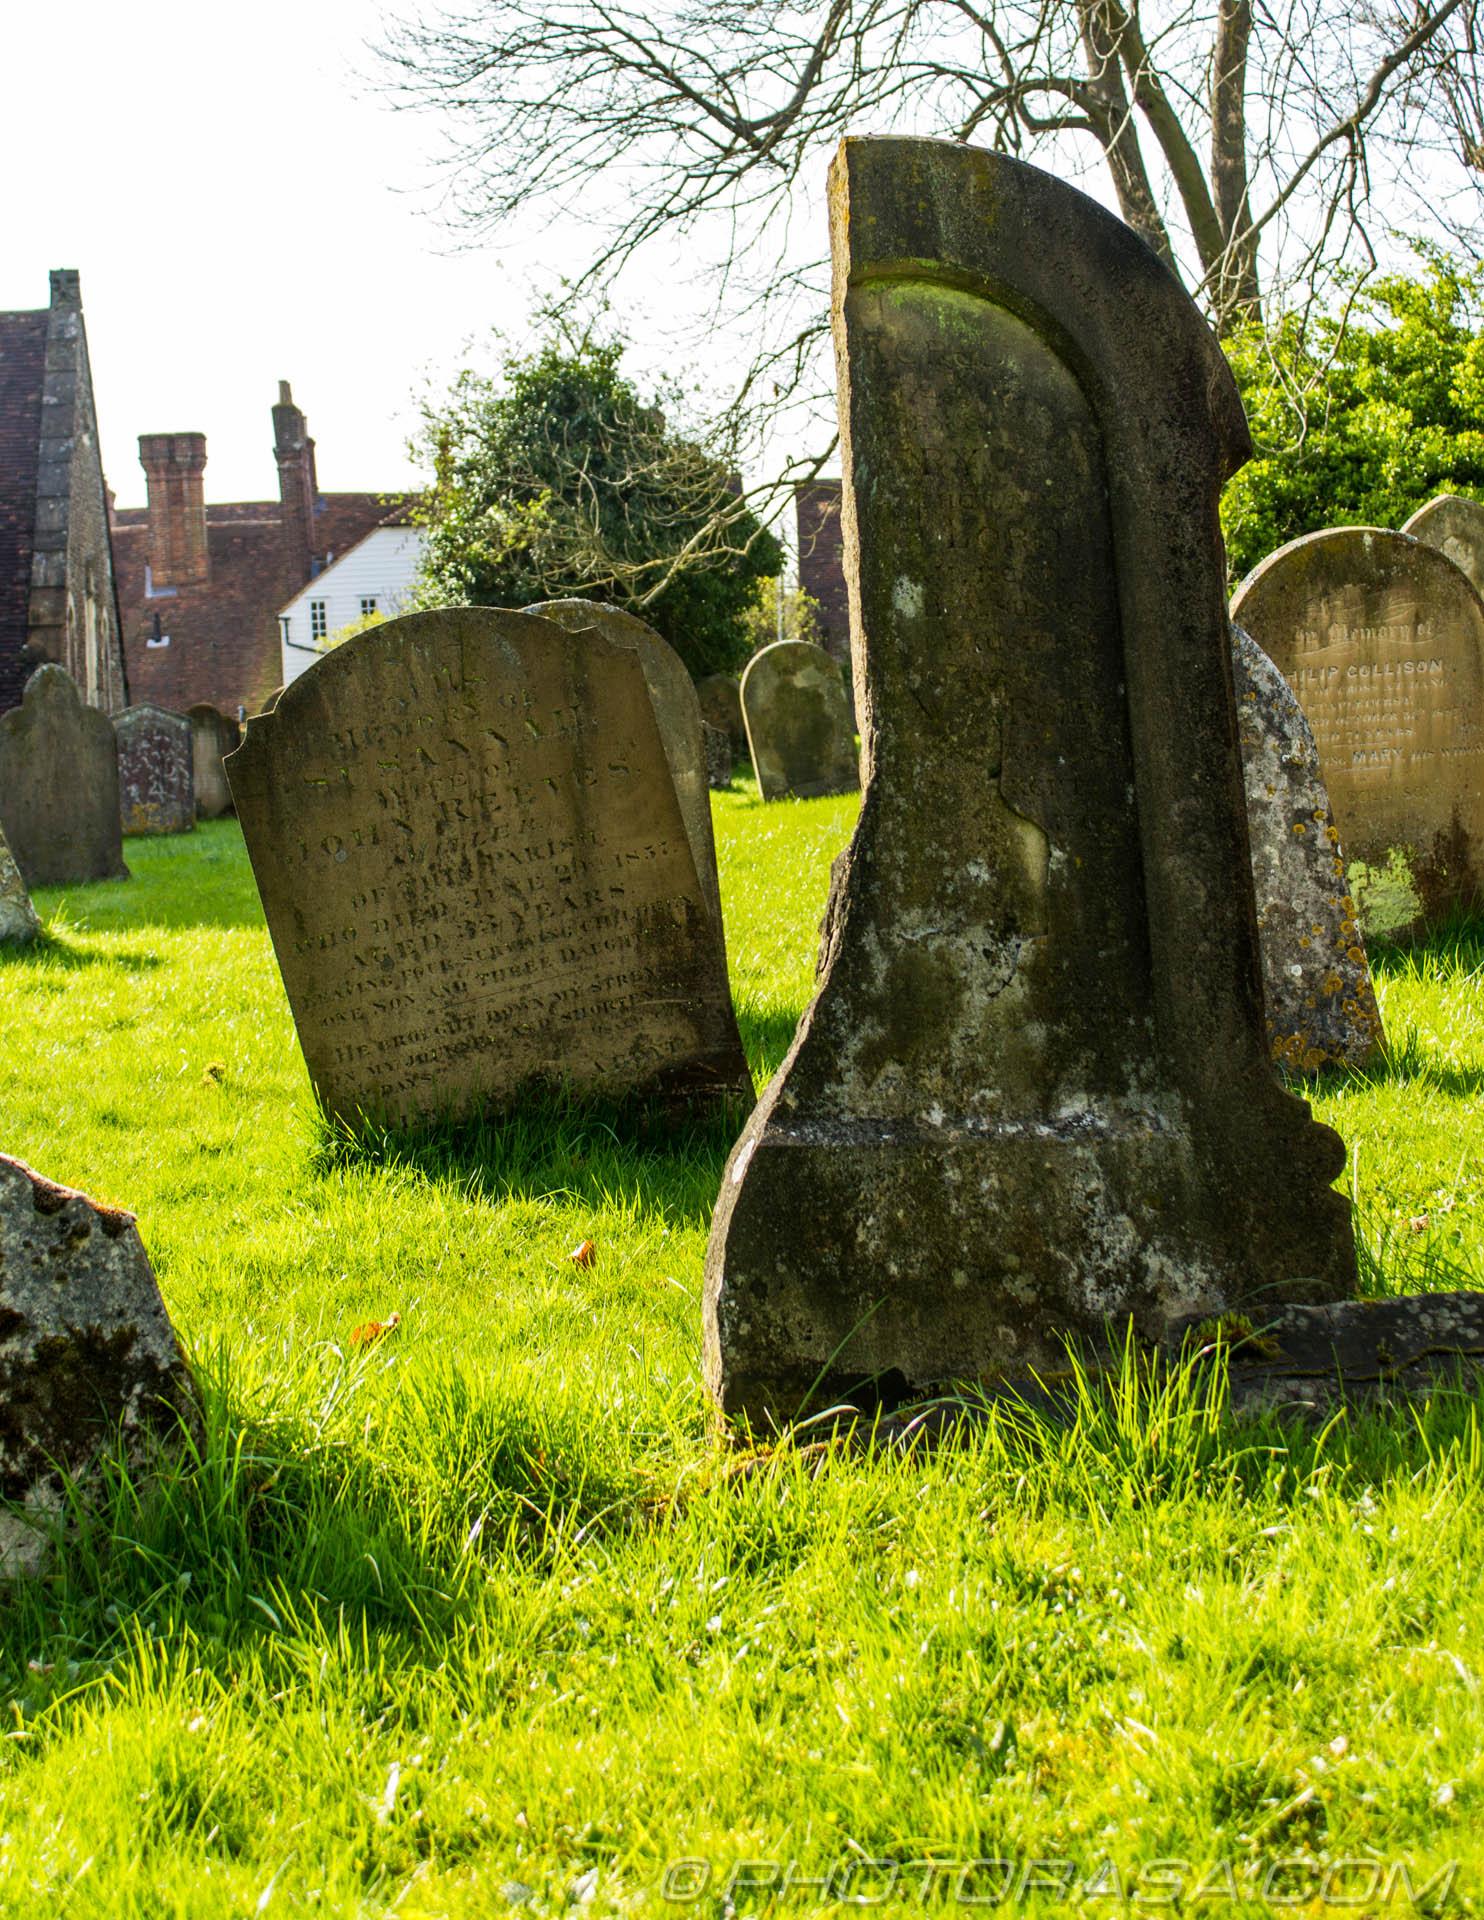 https://photorasa.com/saints-church-staplehurst-kent/damaged-and-split-stone-grave-2/